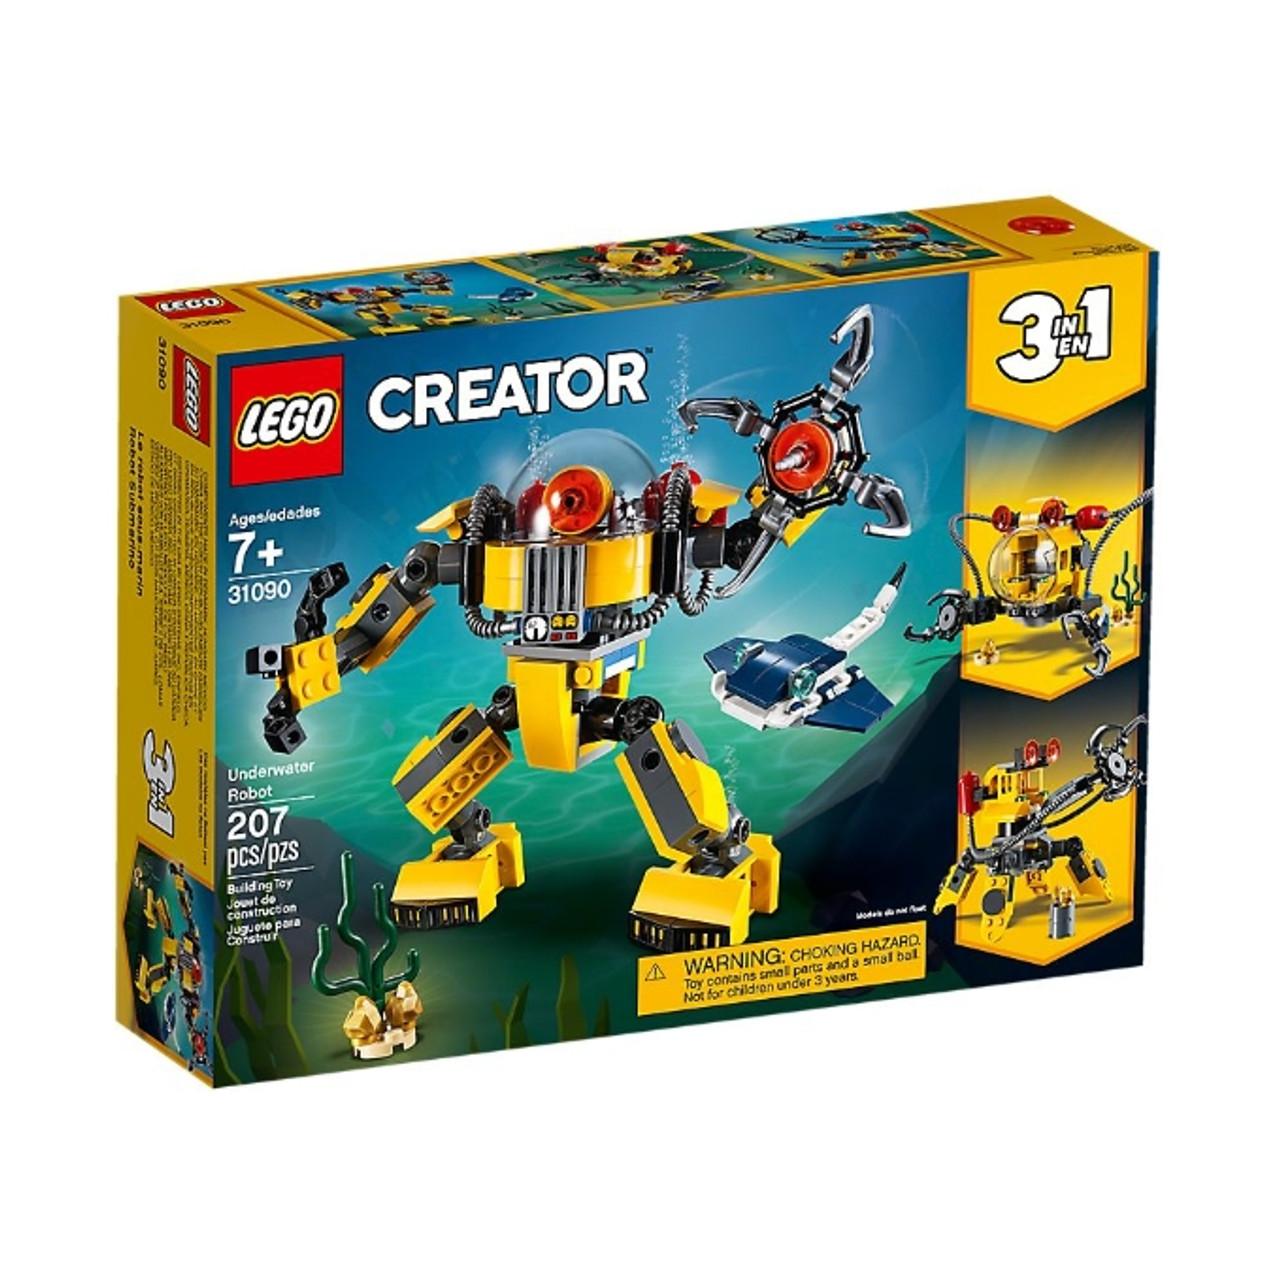 LEGO 31090 Creator Underwater Robot